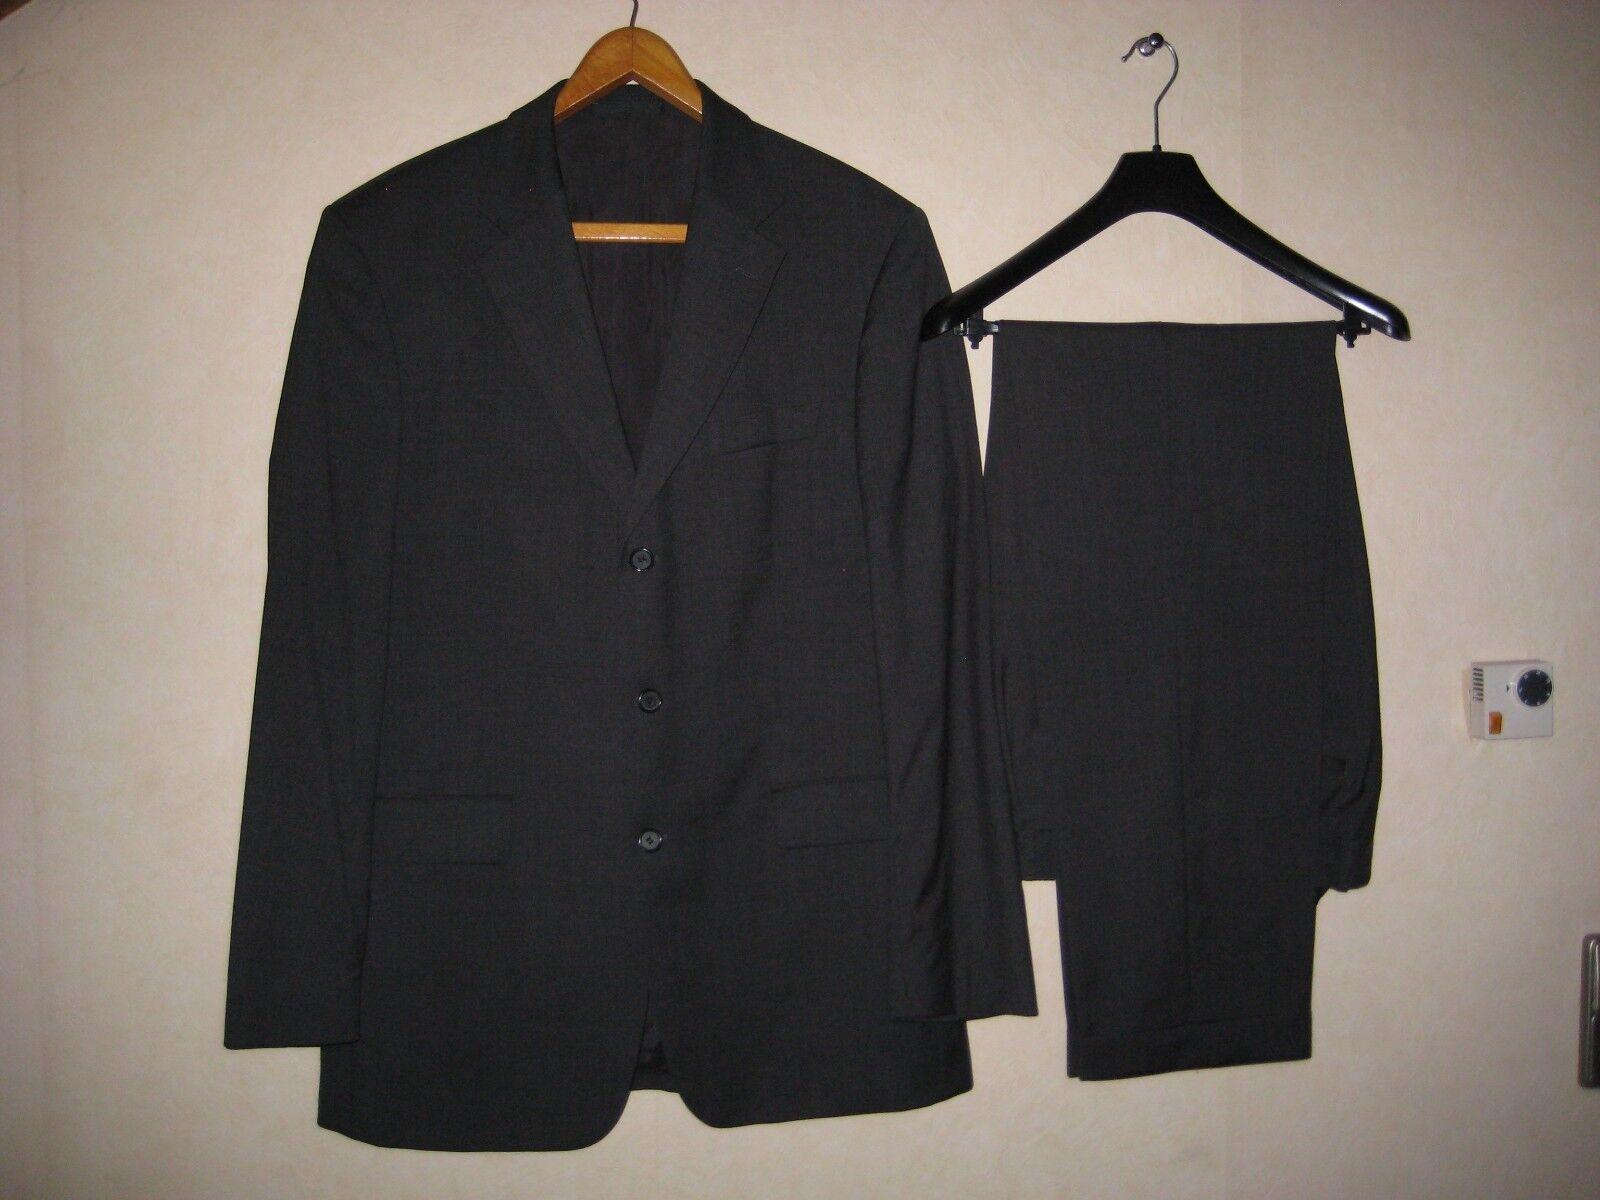 Hugo Boss Herren Anzug Gr.102 grau einreihig Modell Da Vinci/Lucca